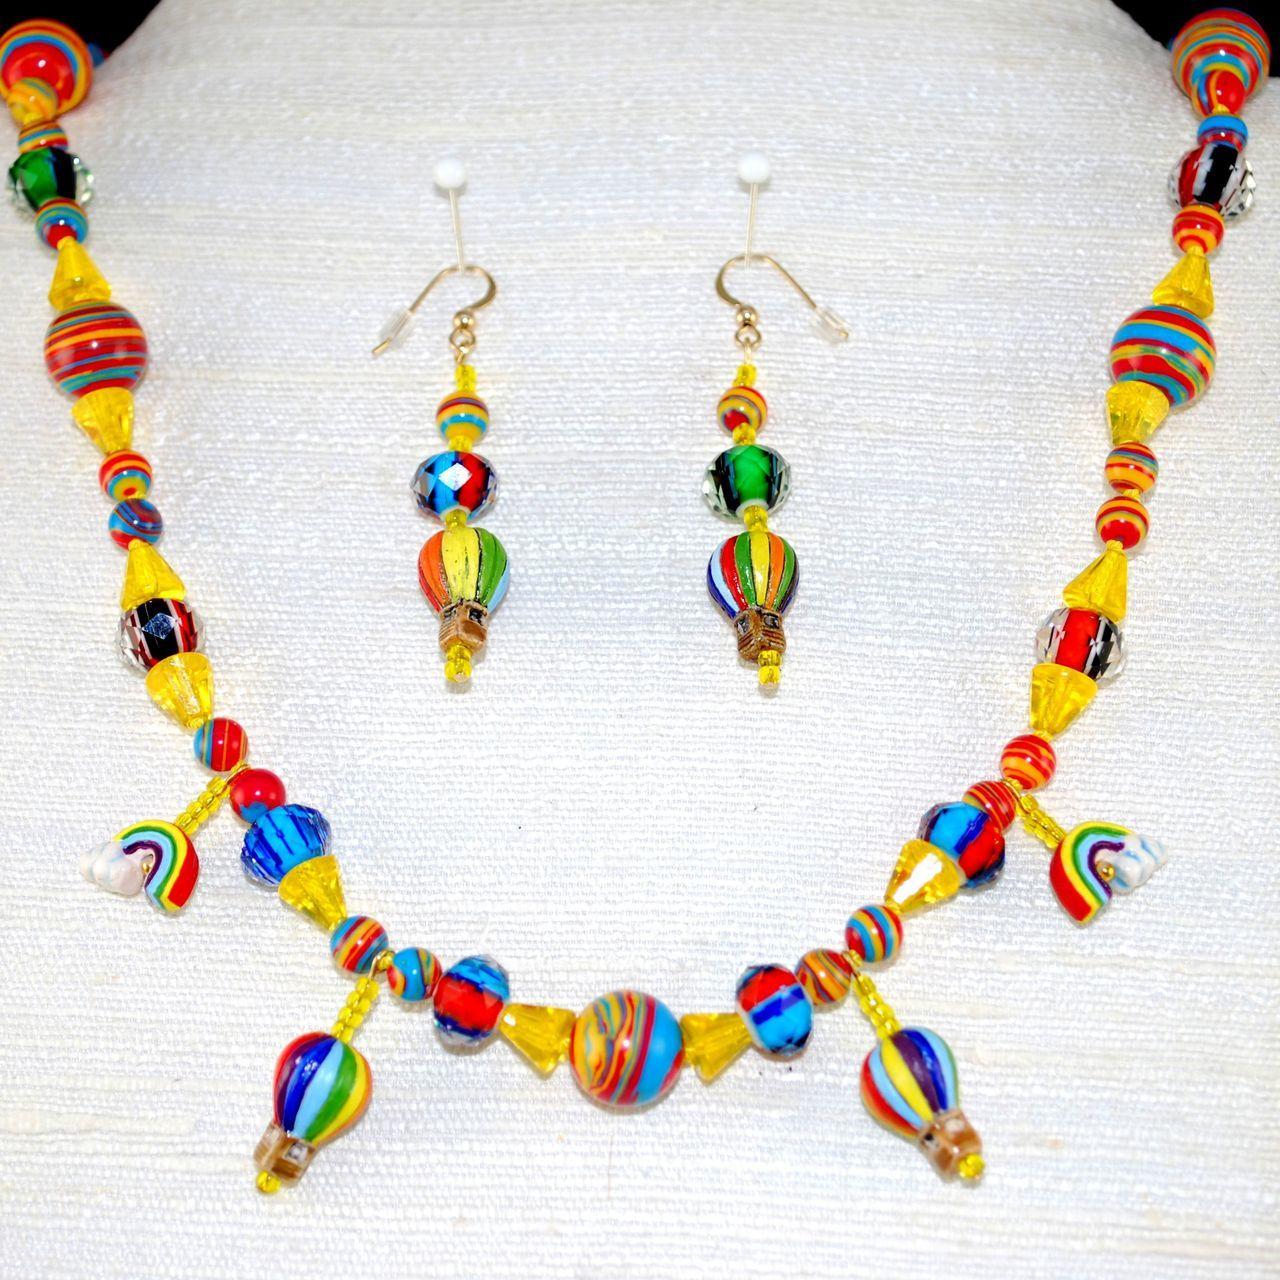 Enchanting Jewelry Creations image 19